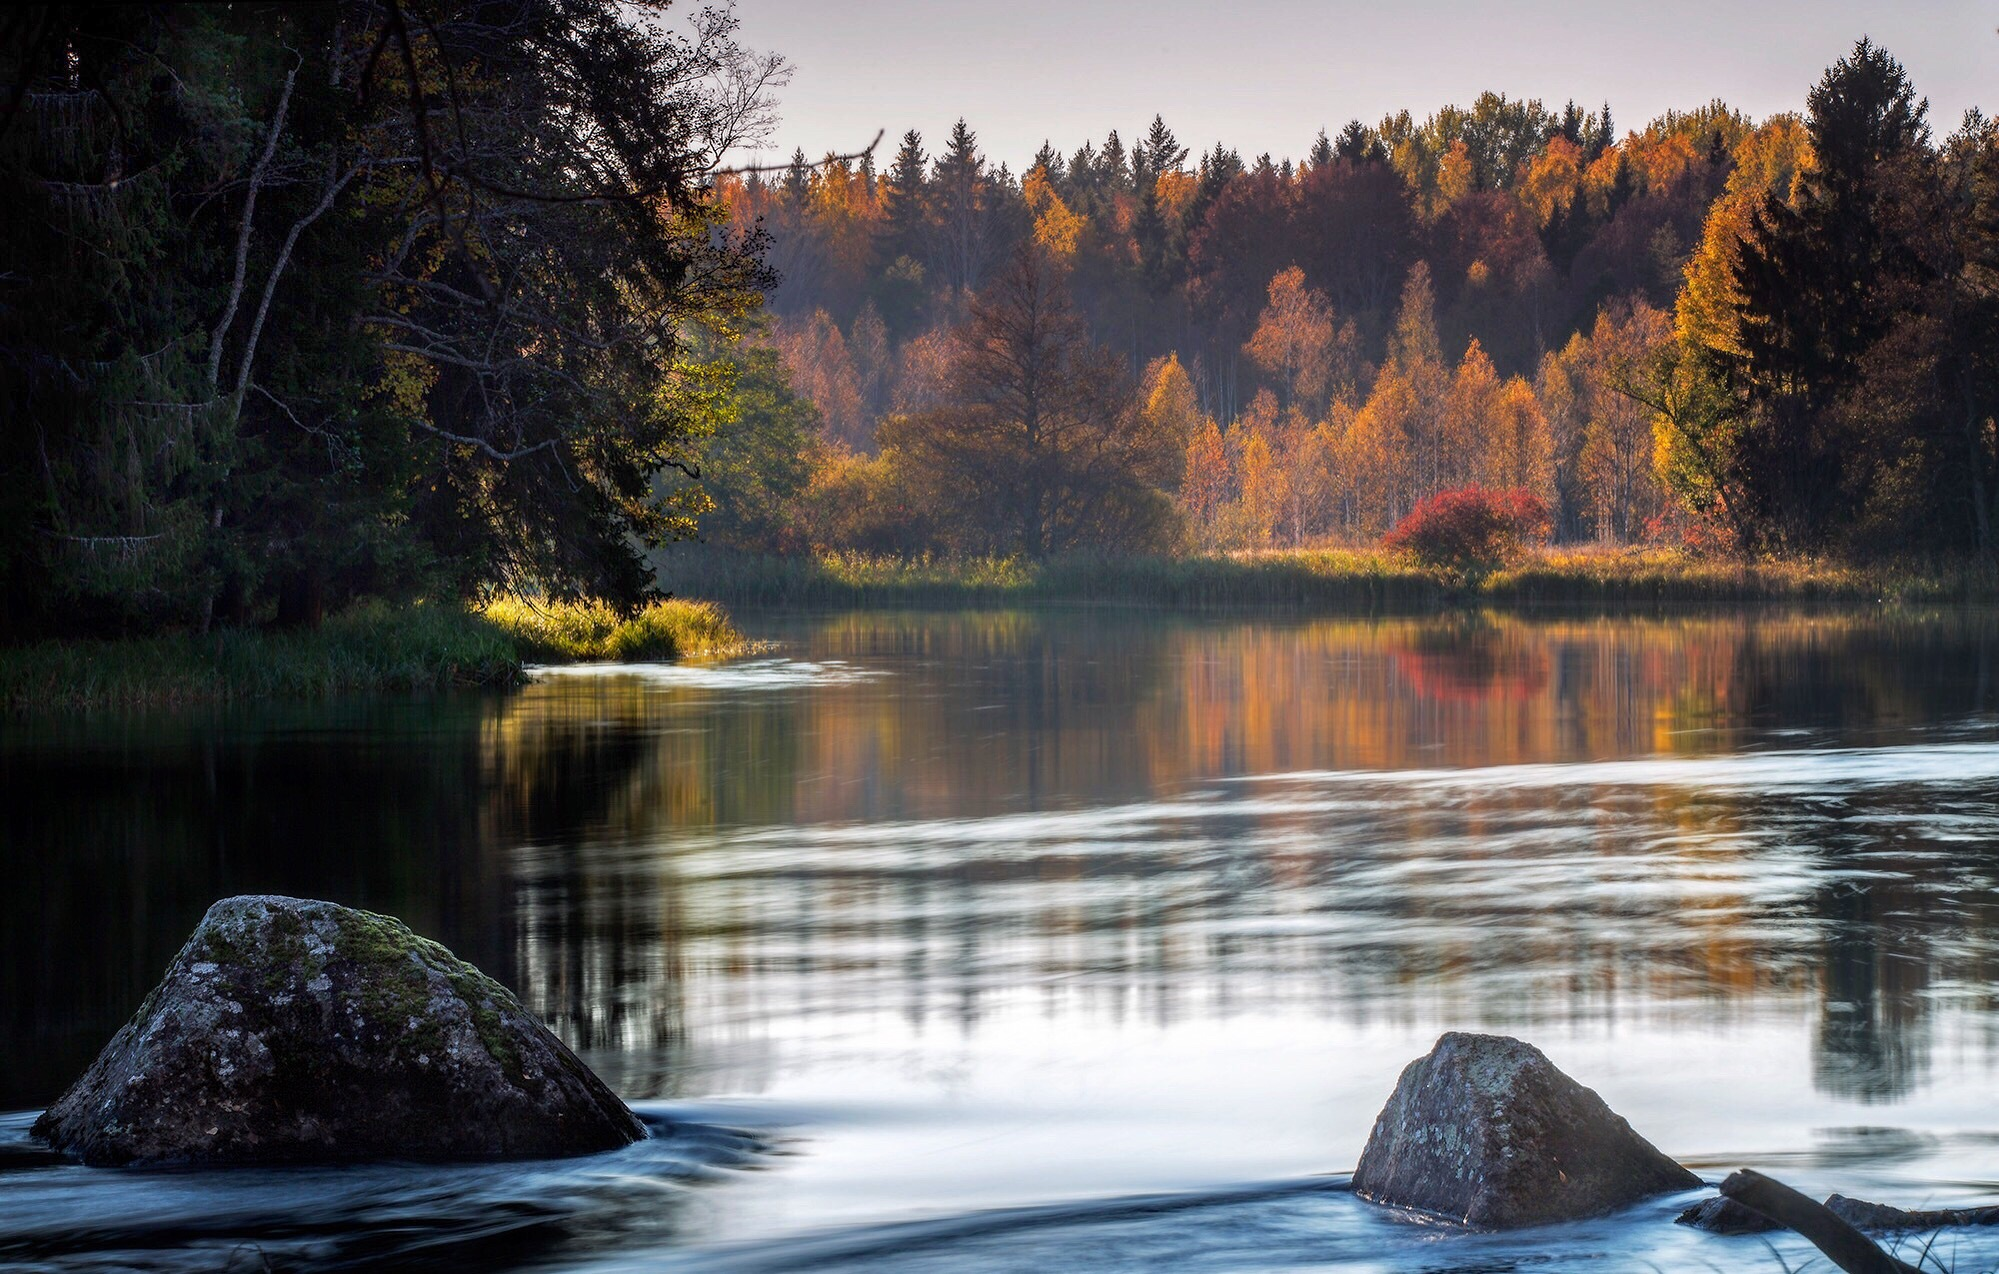 Colours of the nature by Par Soderman